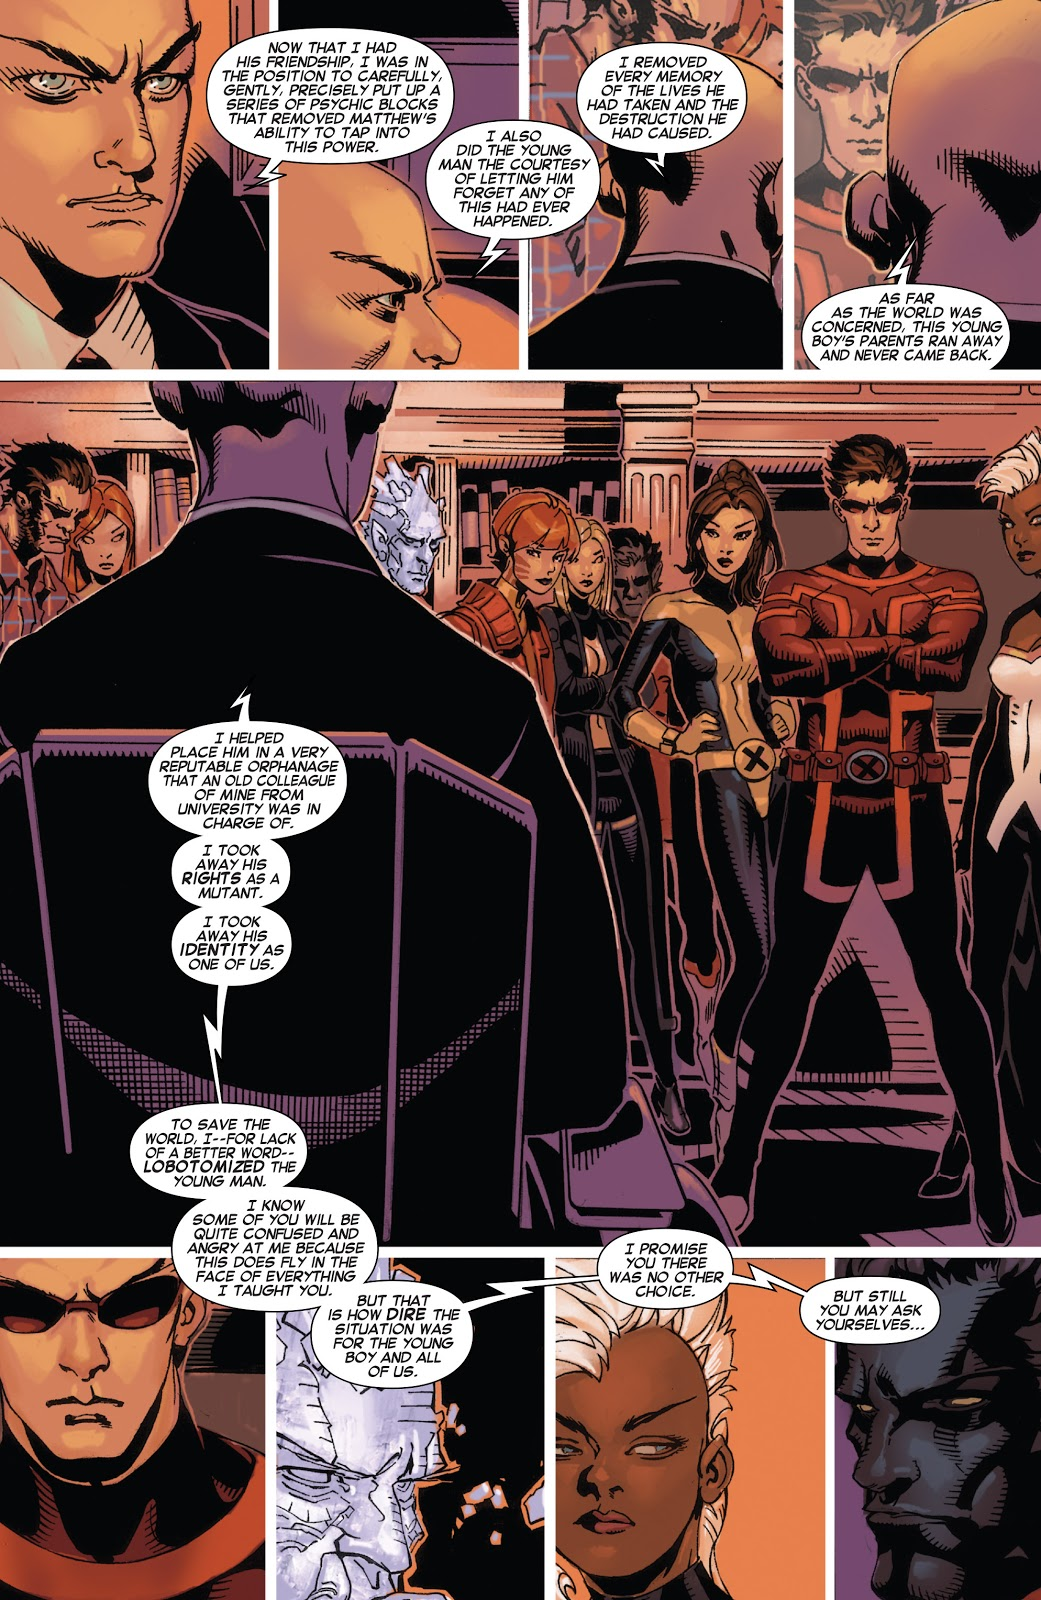 Why Professor X Was Afraid Of Matthew Mallow